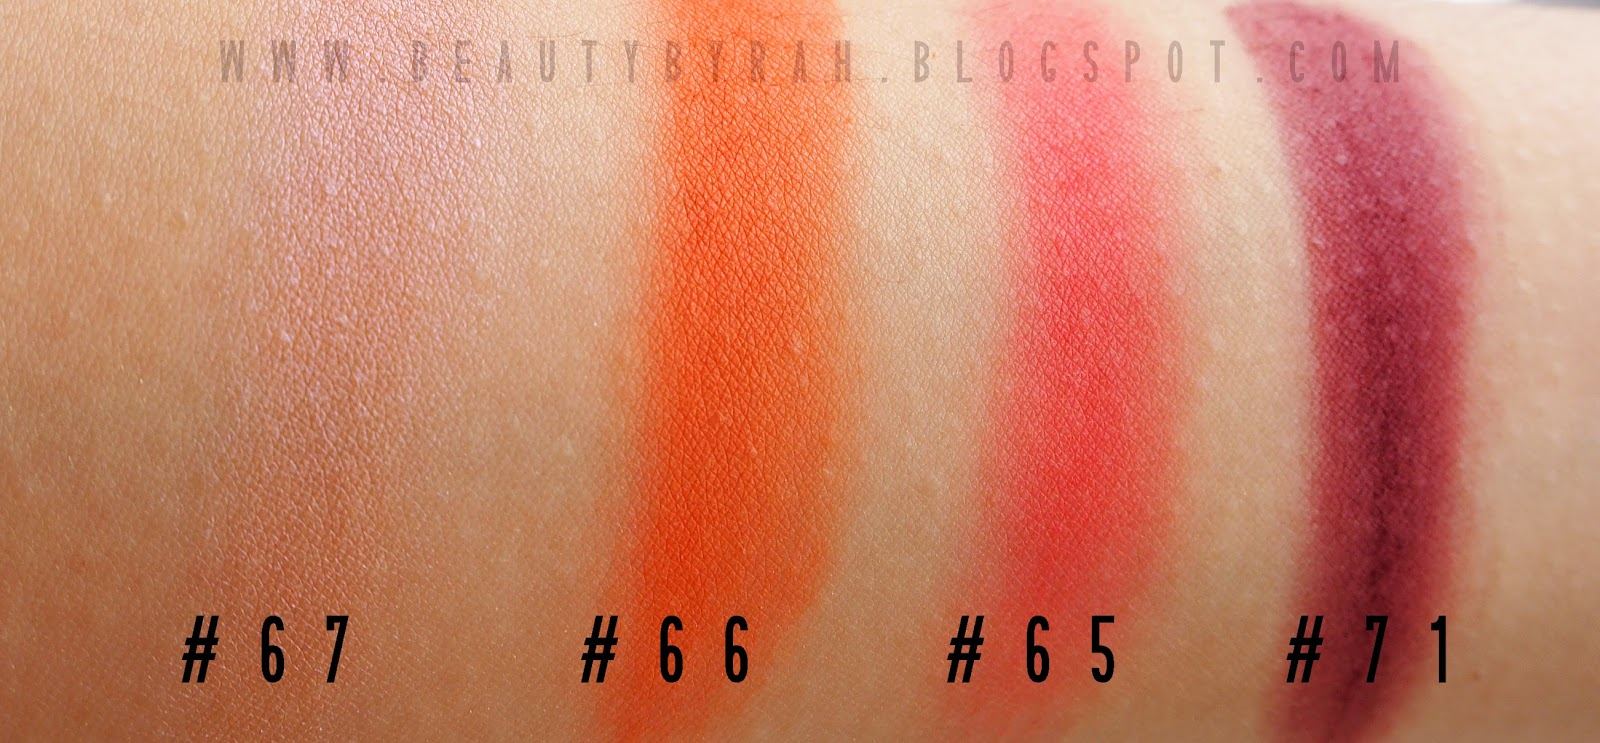 Morphe brushes single eyeshadow swatches red and burgundy